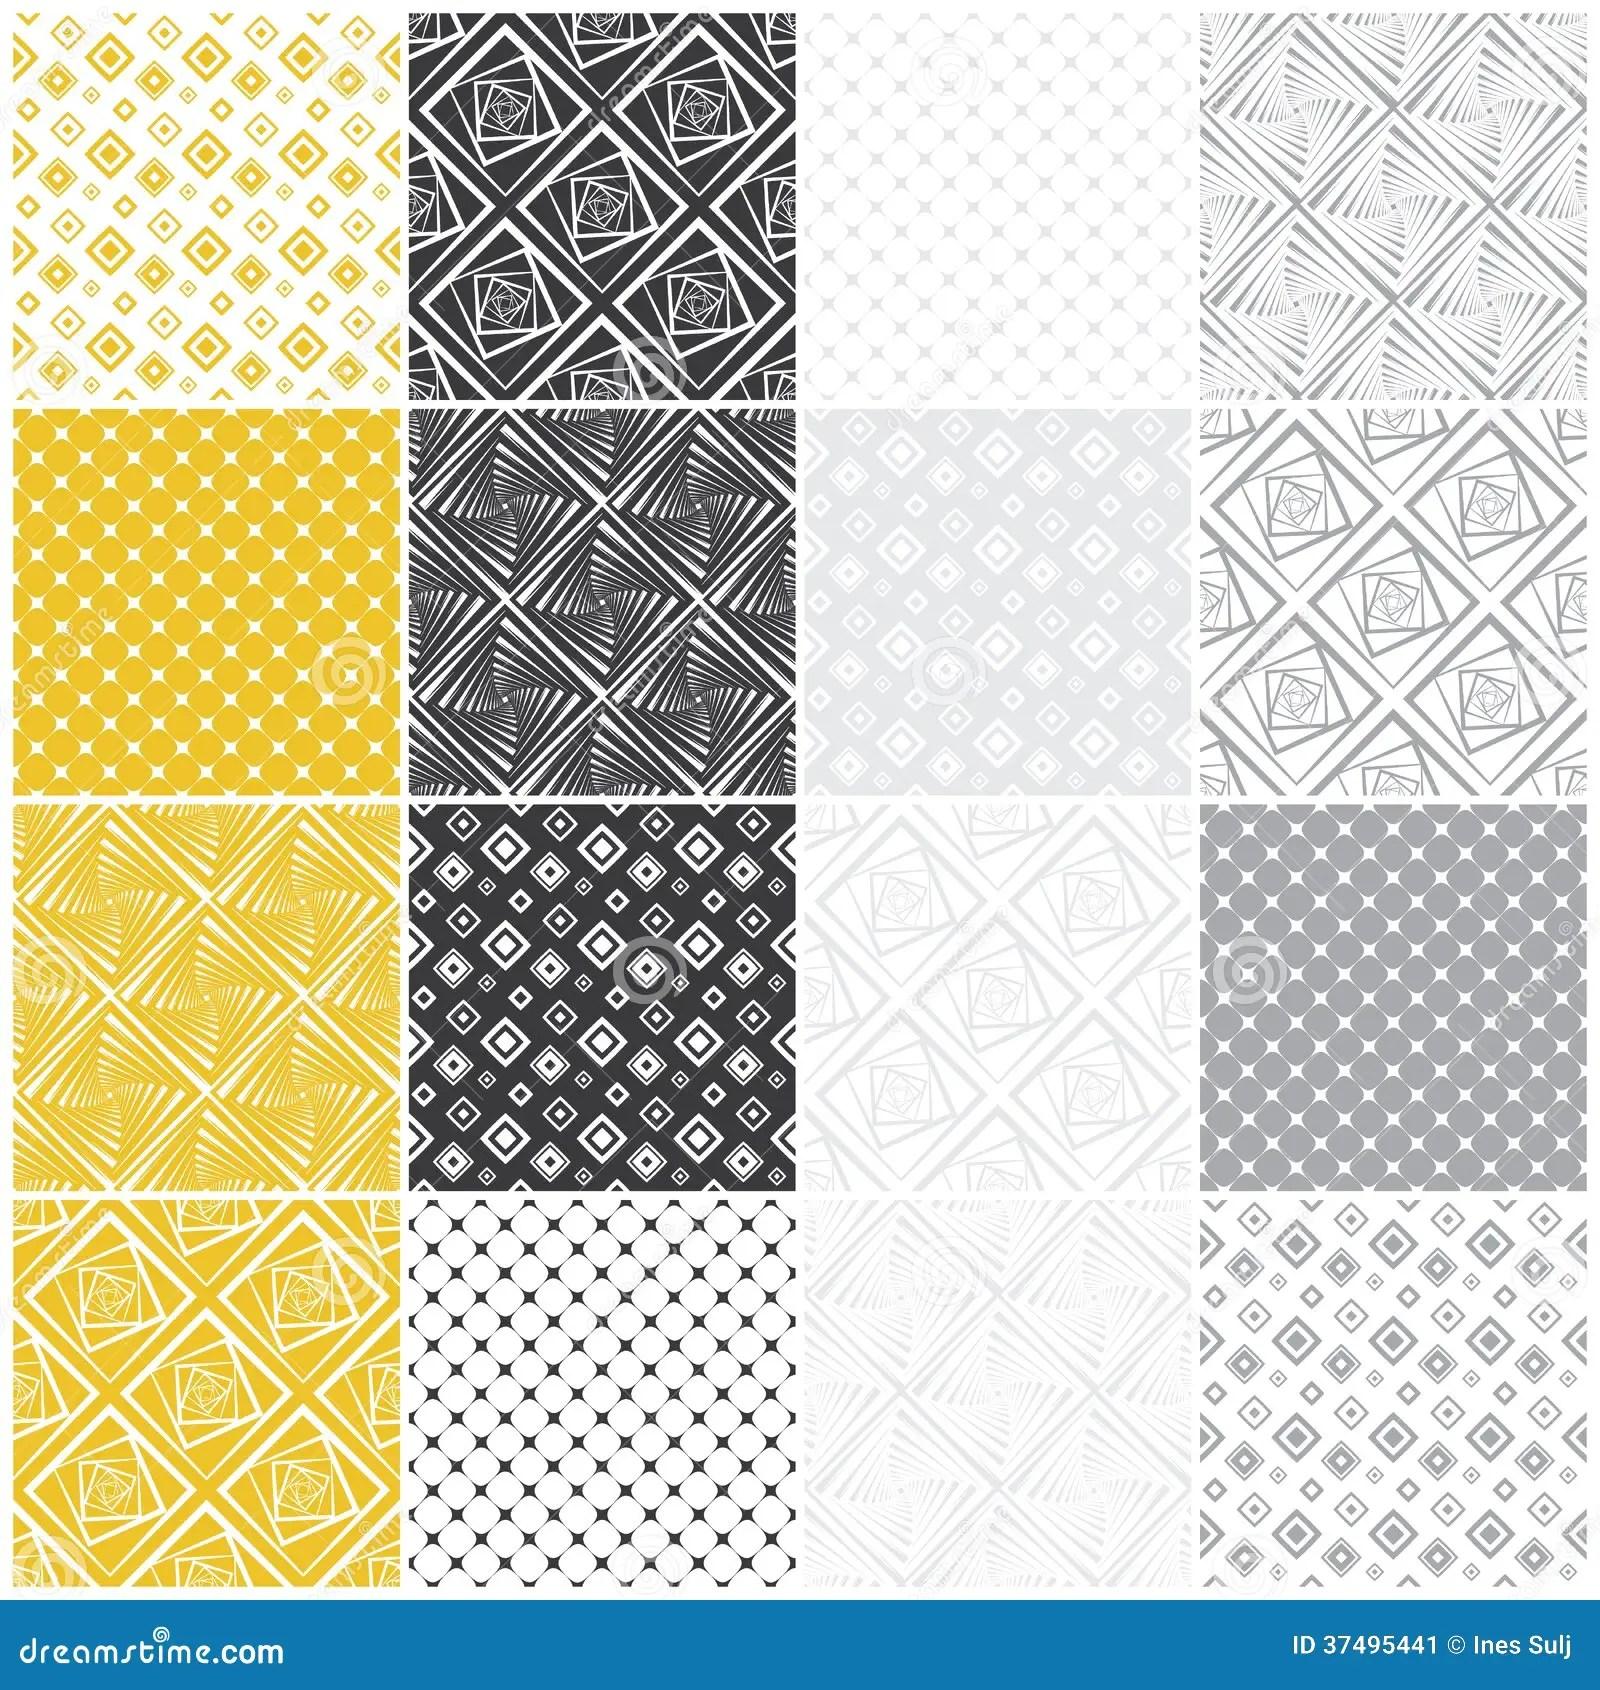 Geometric Seamless Patterns Squares Stock Image